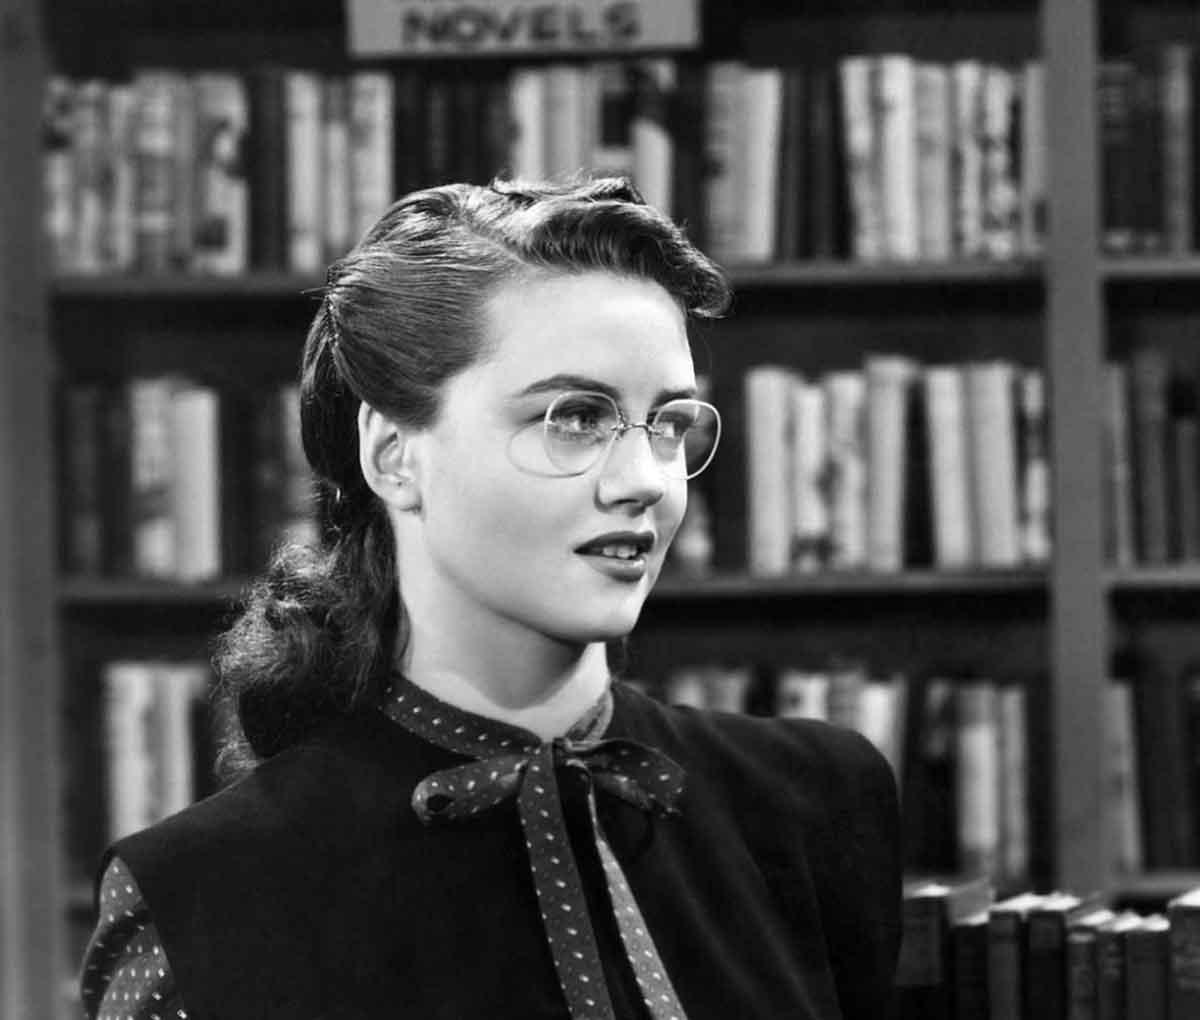 Girls Who Wear Glasses 1940s Beauty Tips Glamourdaze